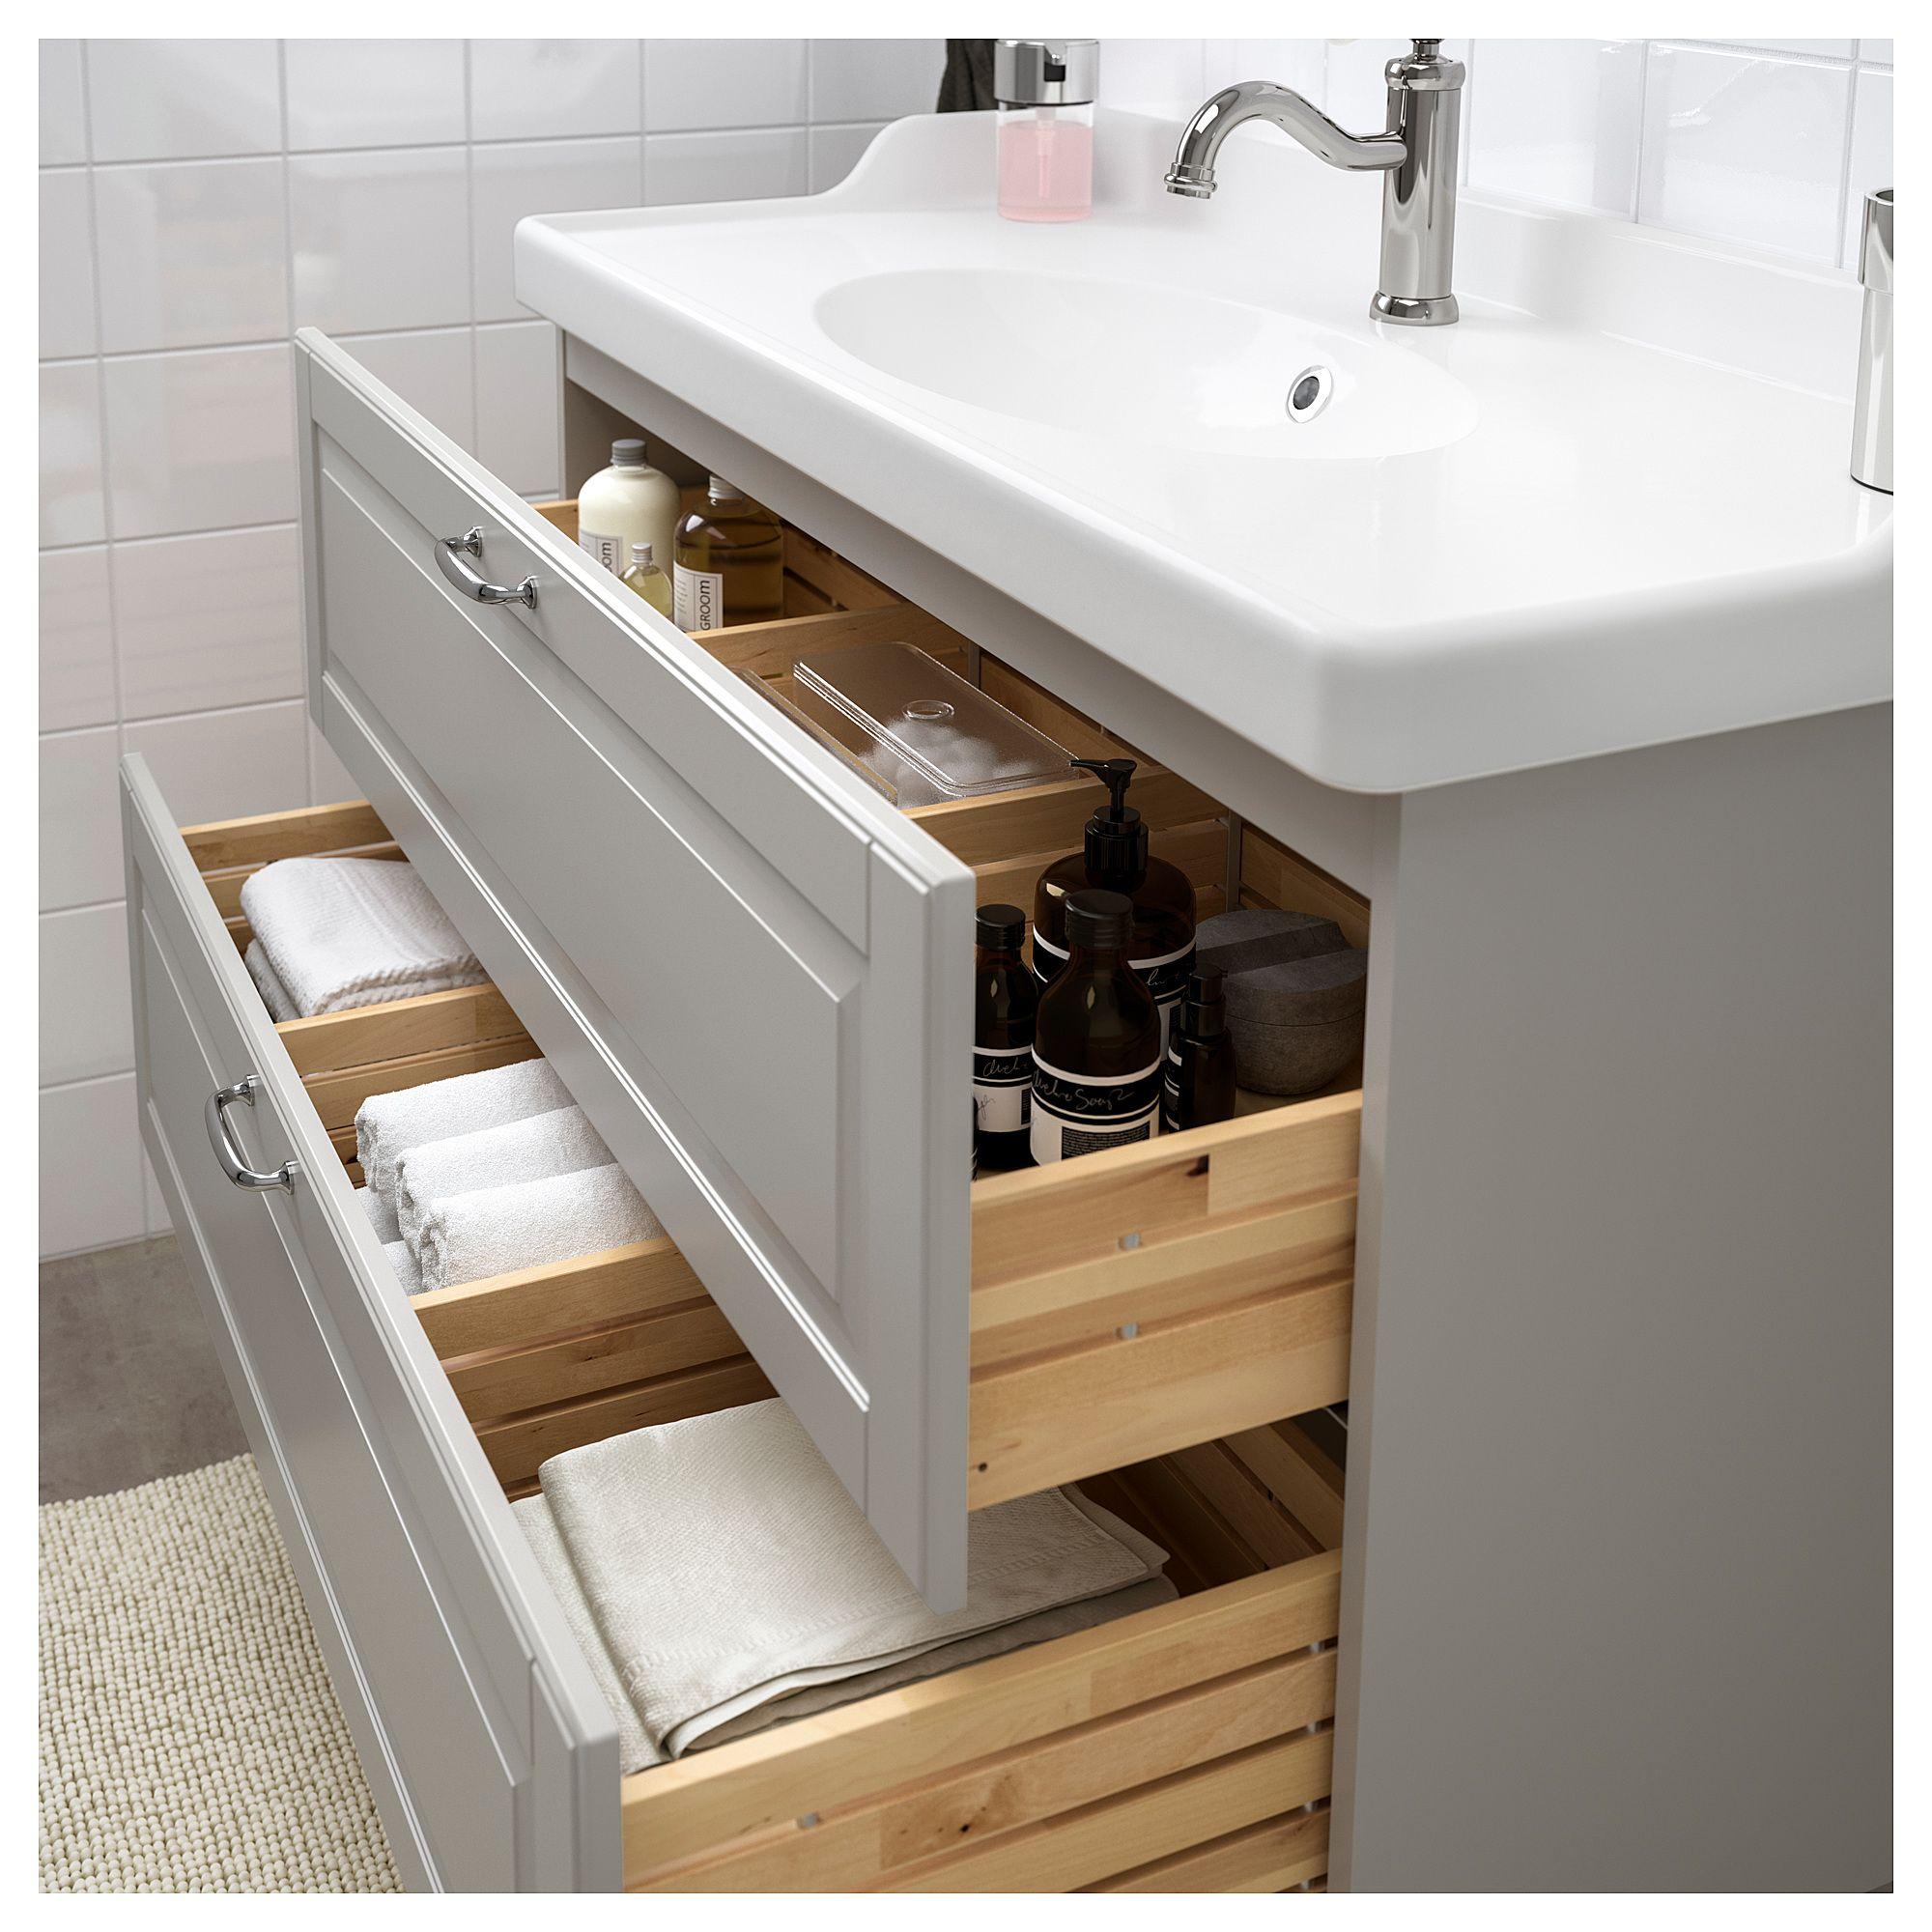 Surprising Godmorgon Rattviken Sink Cabinet With 2 Drawers Kasjon Home Interior And Landscaping Eliaenasavecom